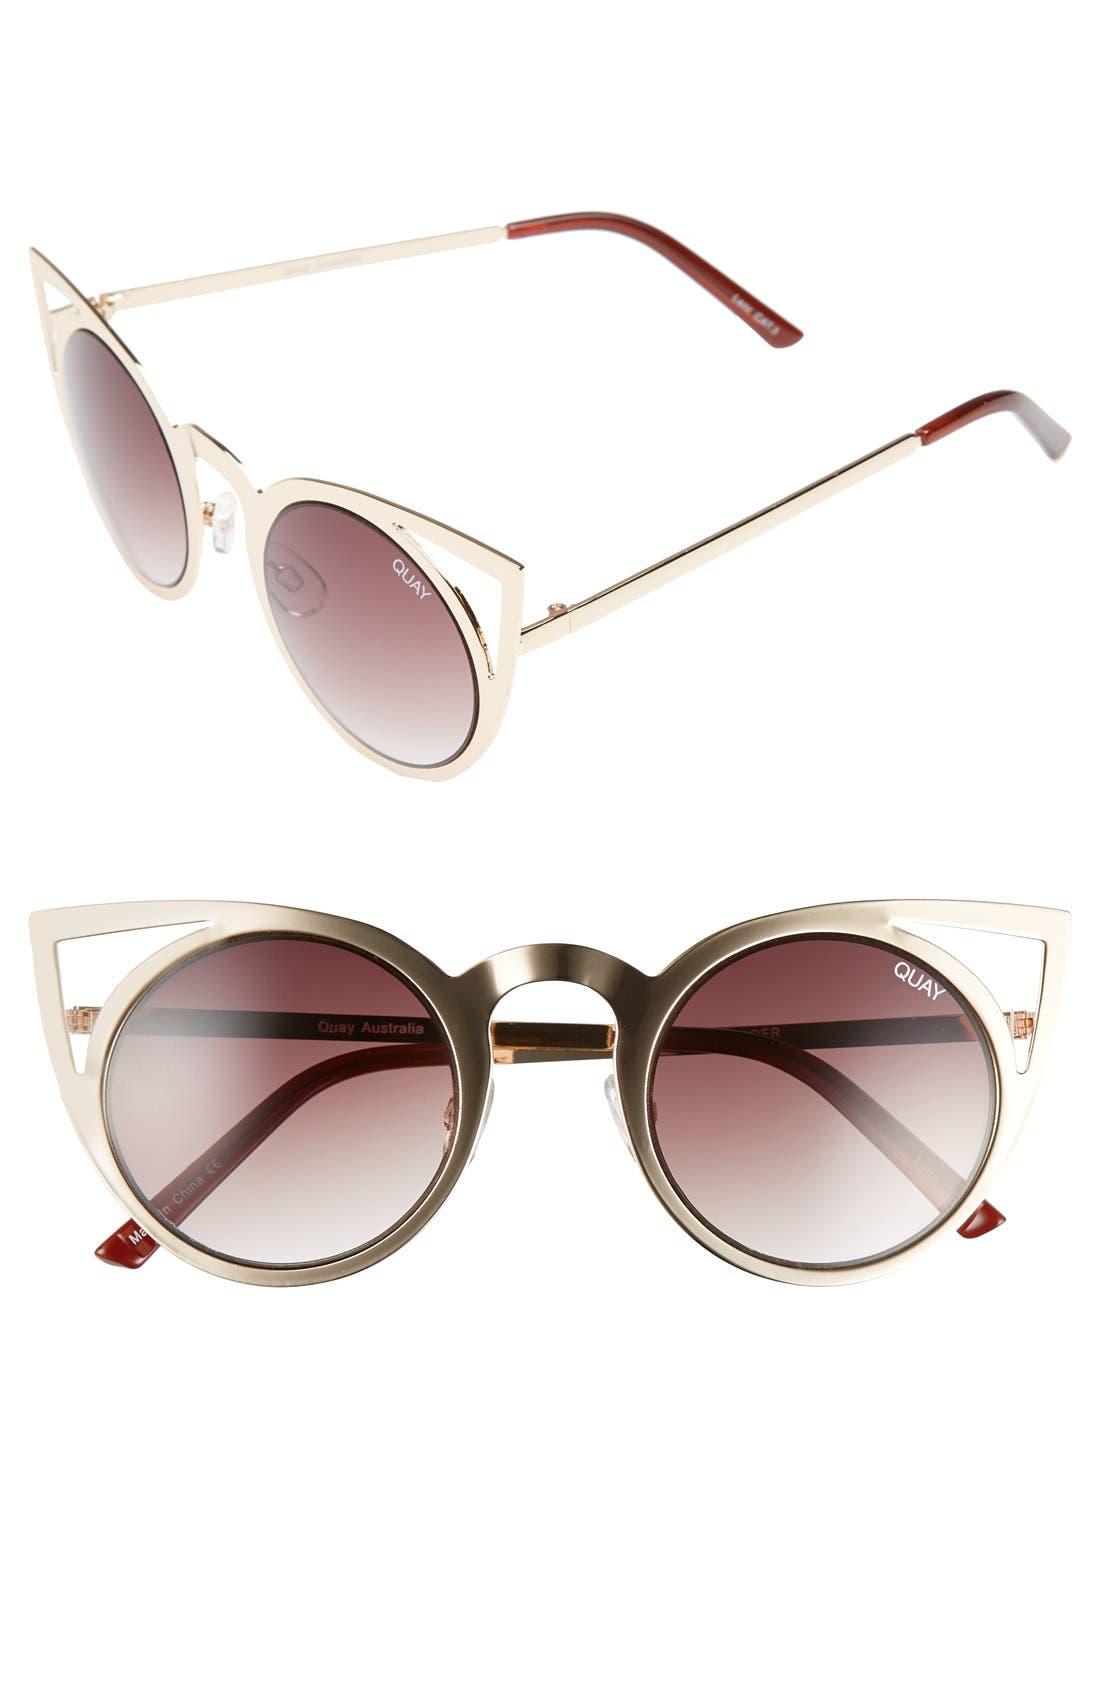 Main Image - Quay Australia 'Invader' 50mm Cat Eye Sunglasses